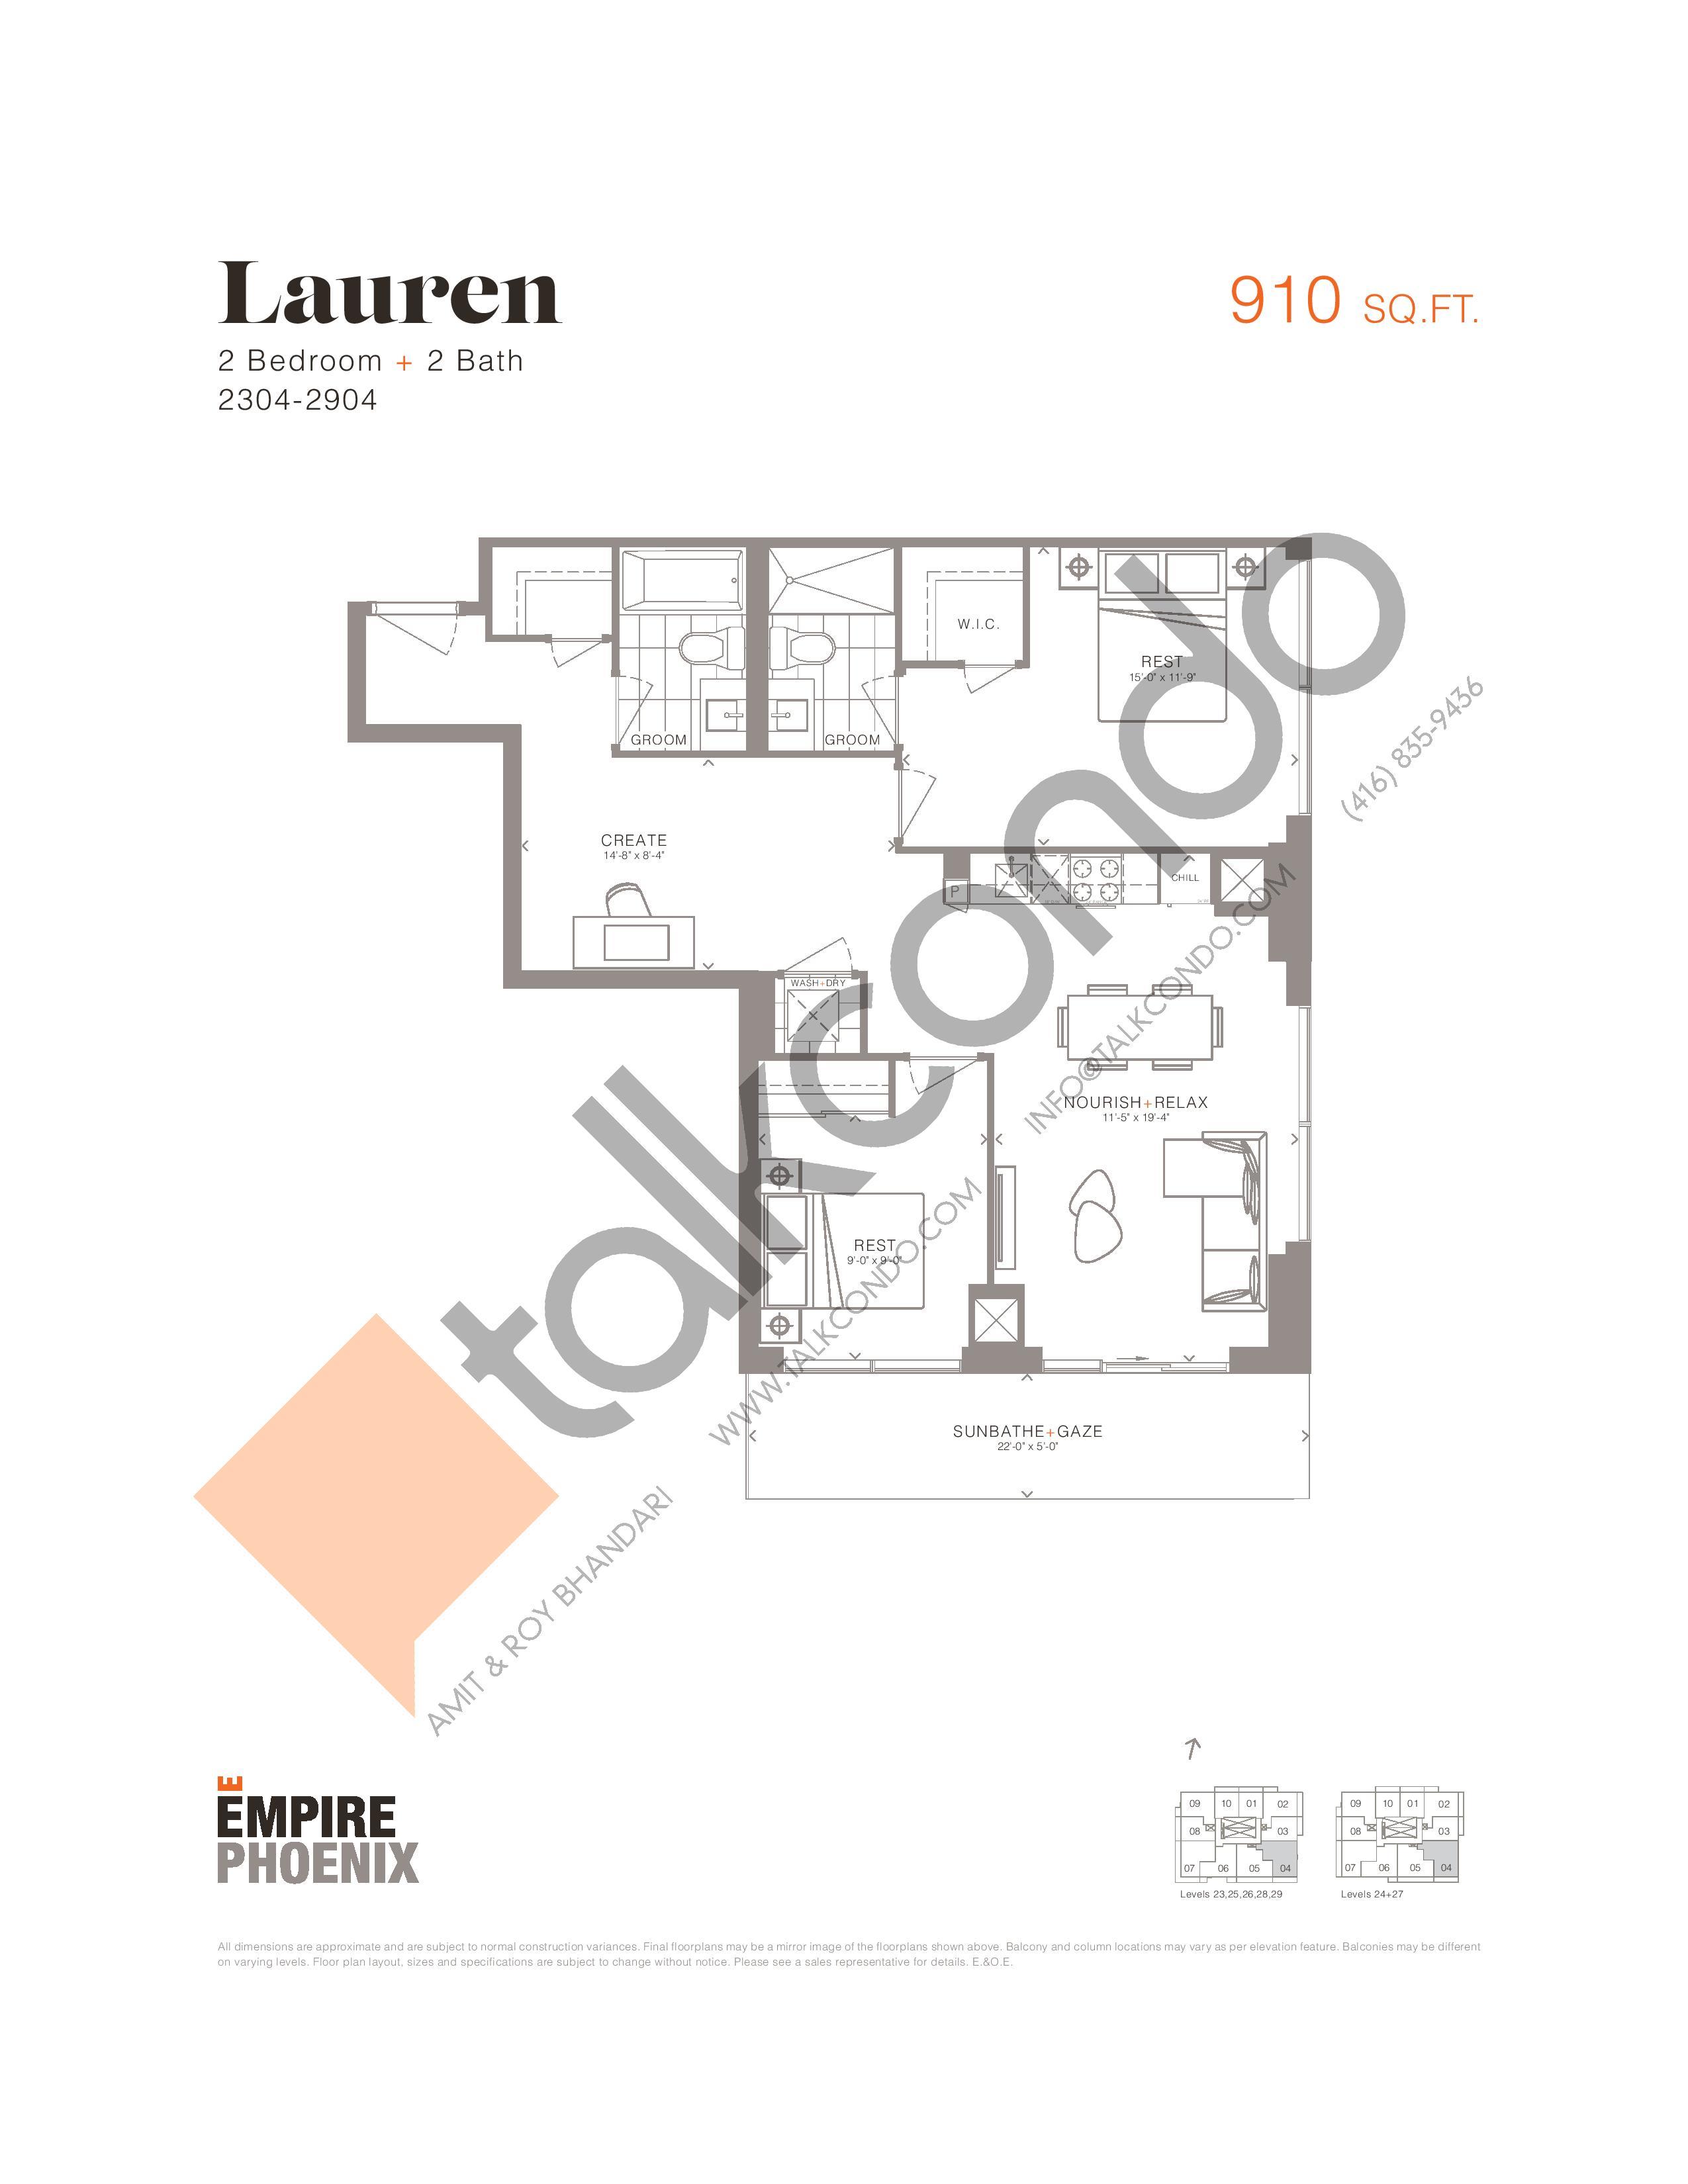 Lauren Floor Plan at Empire Phoenix Phase 2 Condos - 910 sq.ft